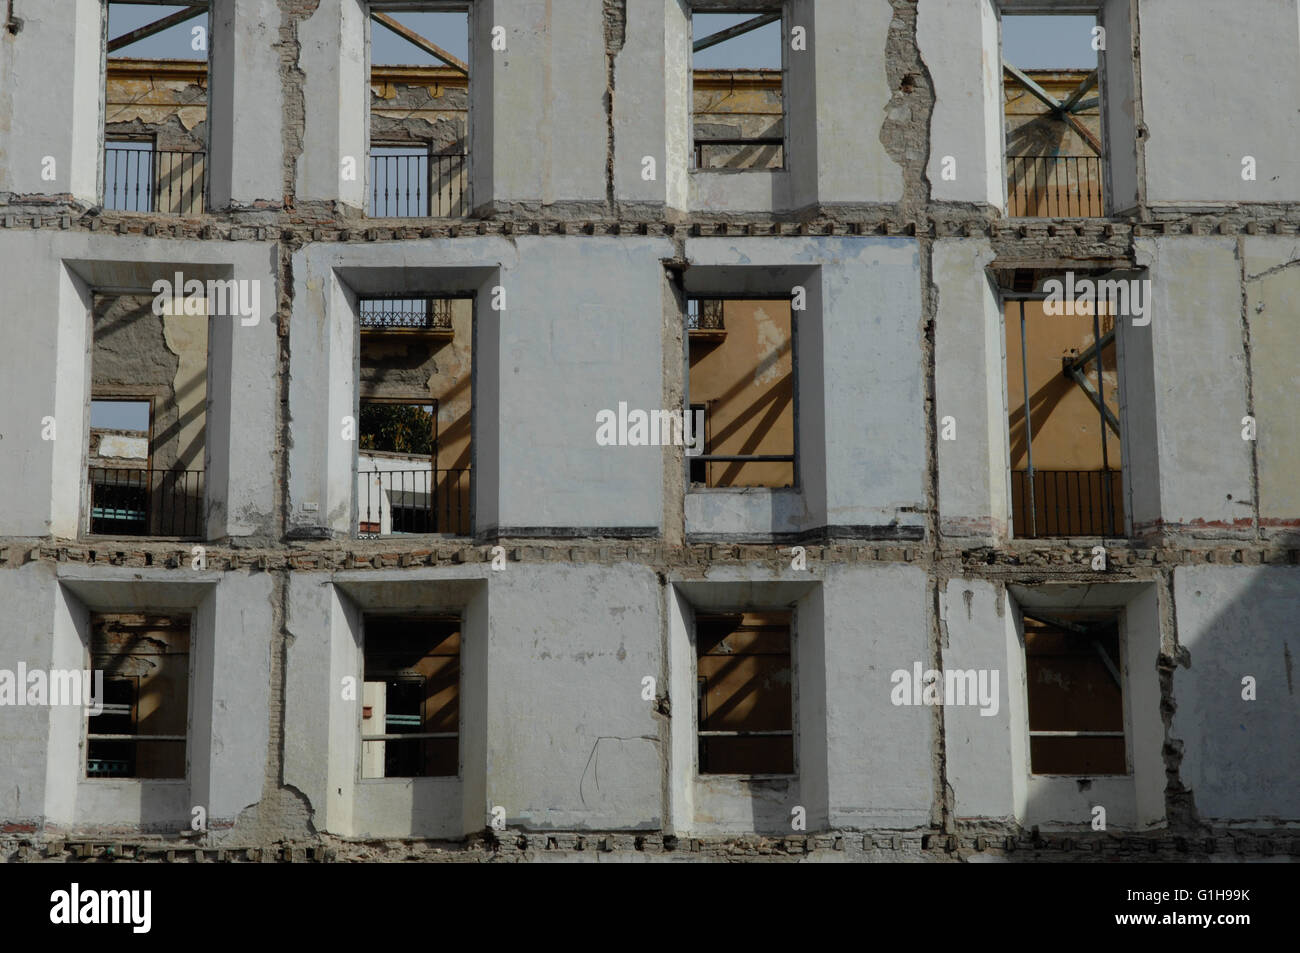 deserted, building,Malaga Spain - Stock Image